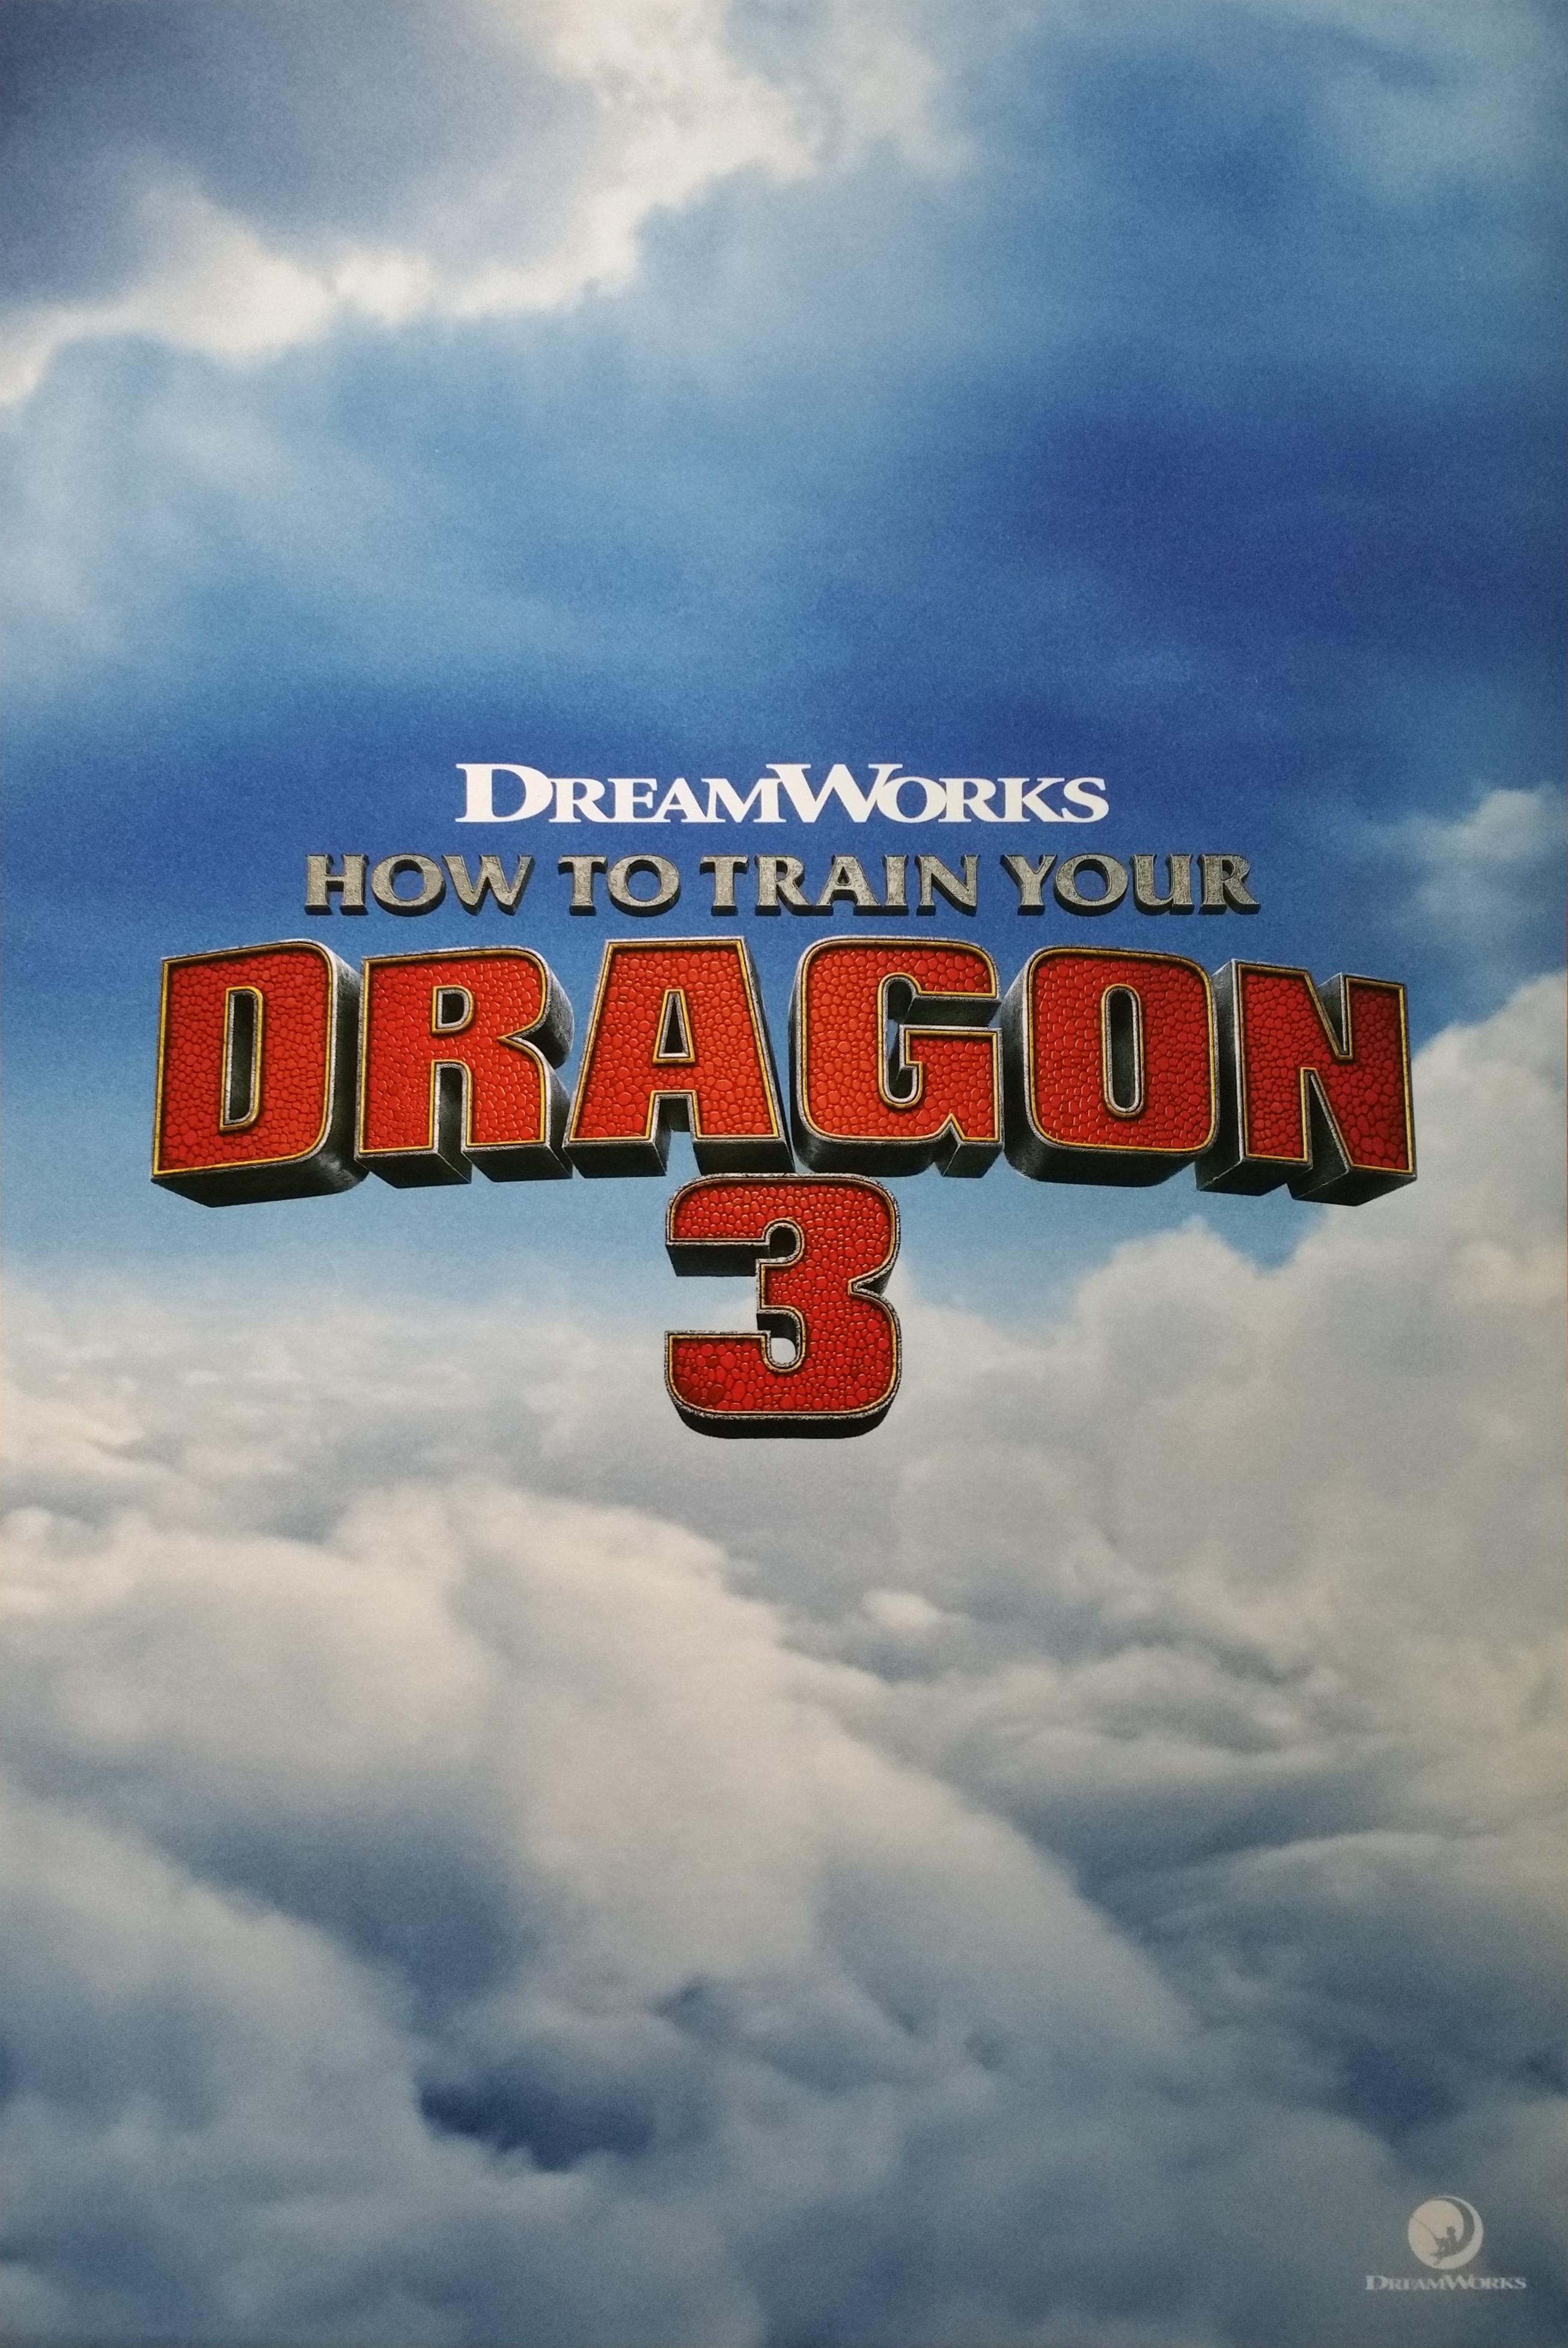 imdb.com how to train your dragon 3